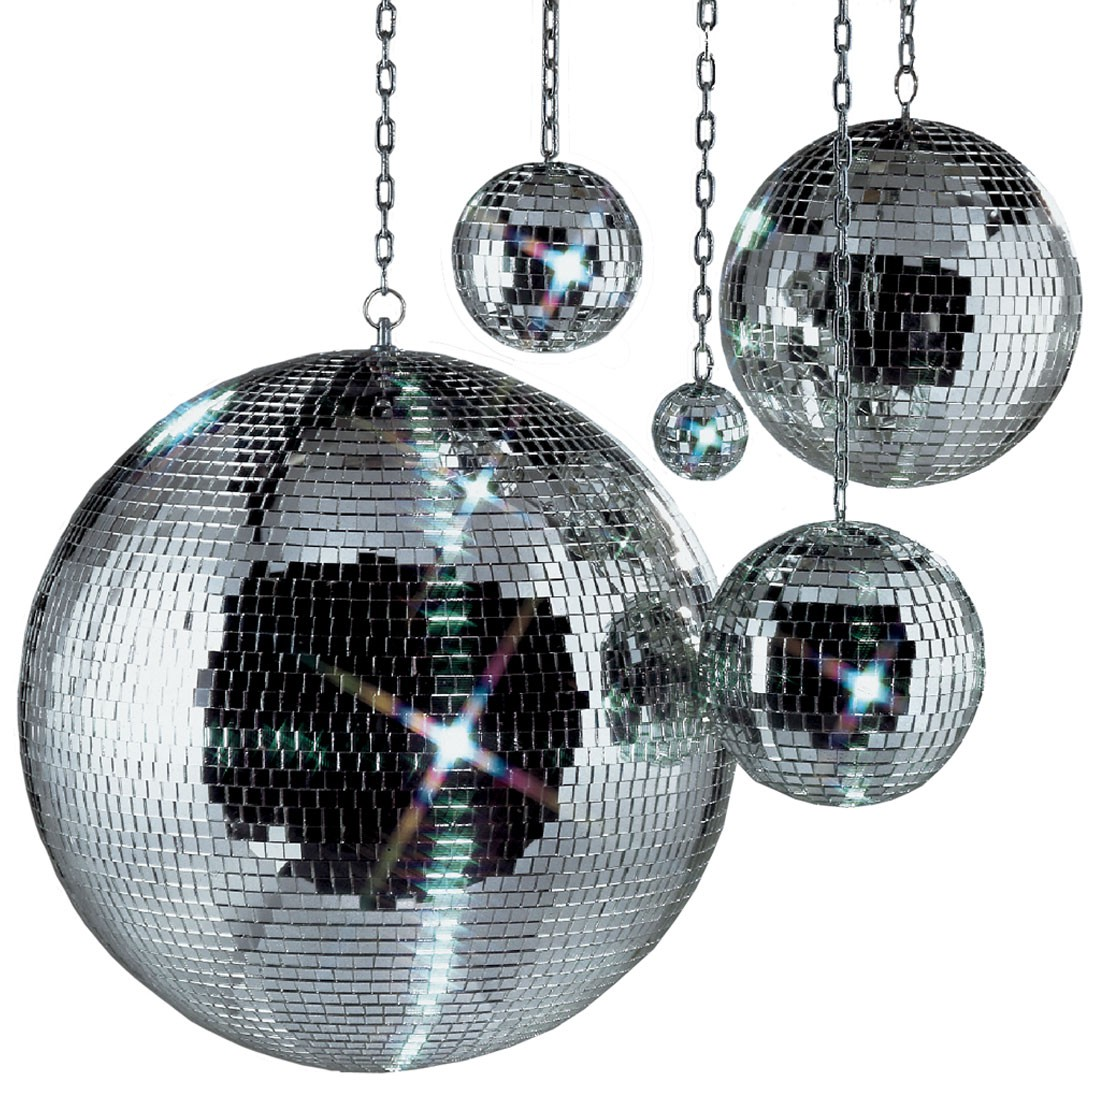 American DJ Mirrorball 1m - kula lustrzana